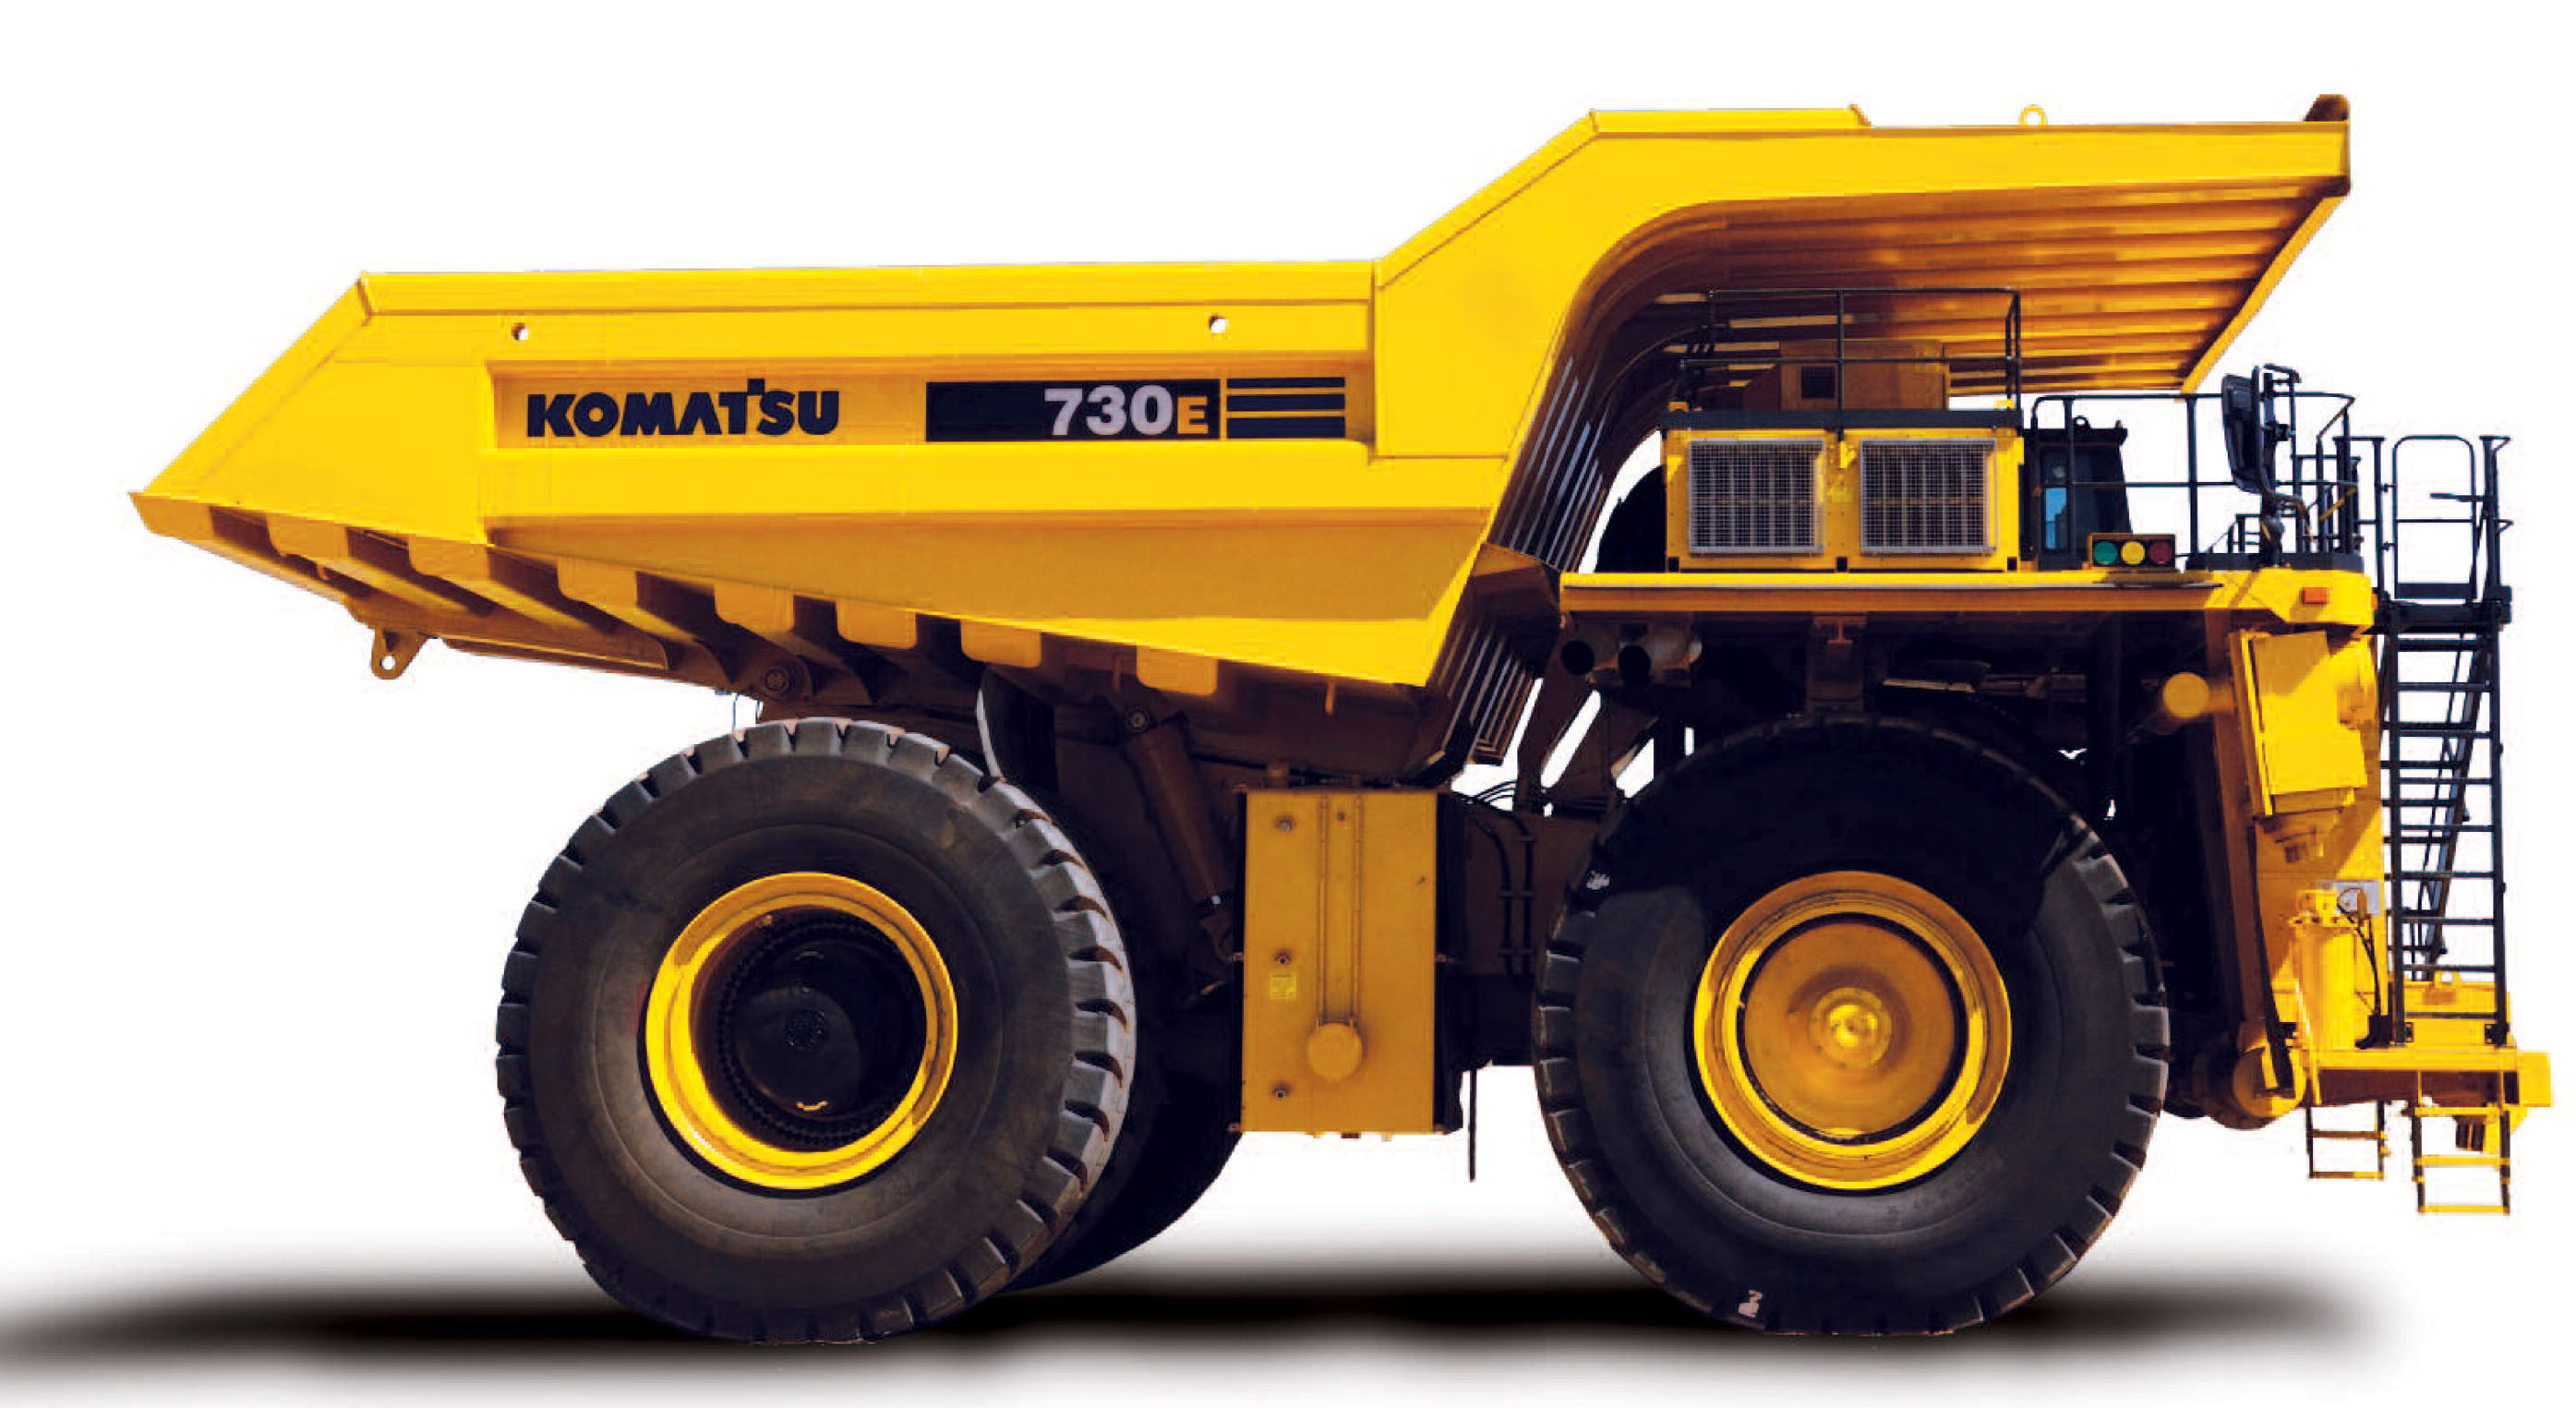 Komatsu 730E Dump Trucks Workshop Repair & Service Manual